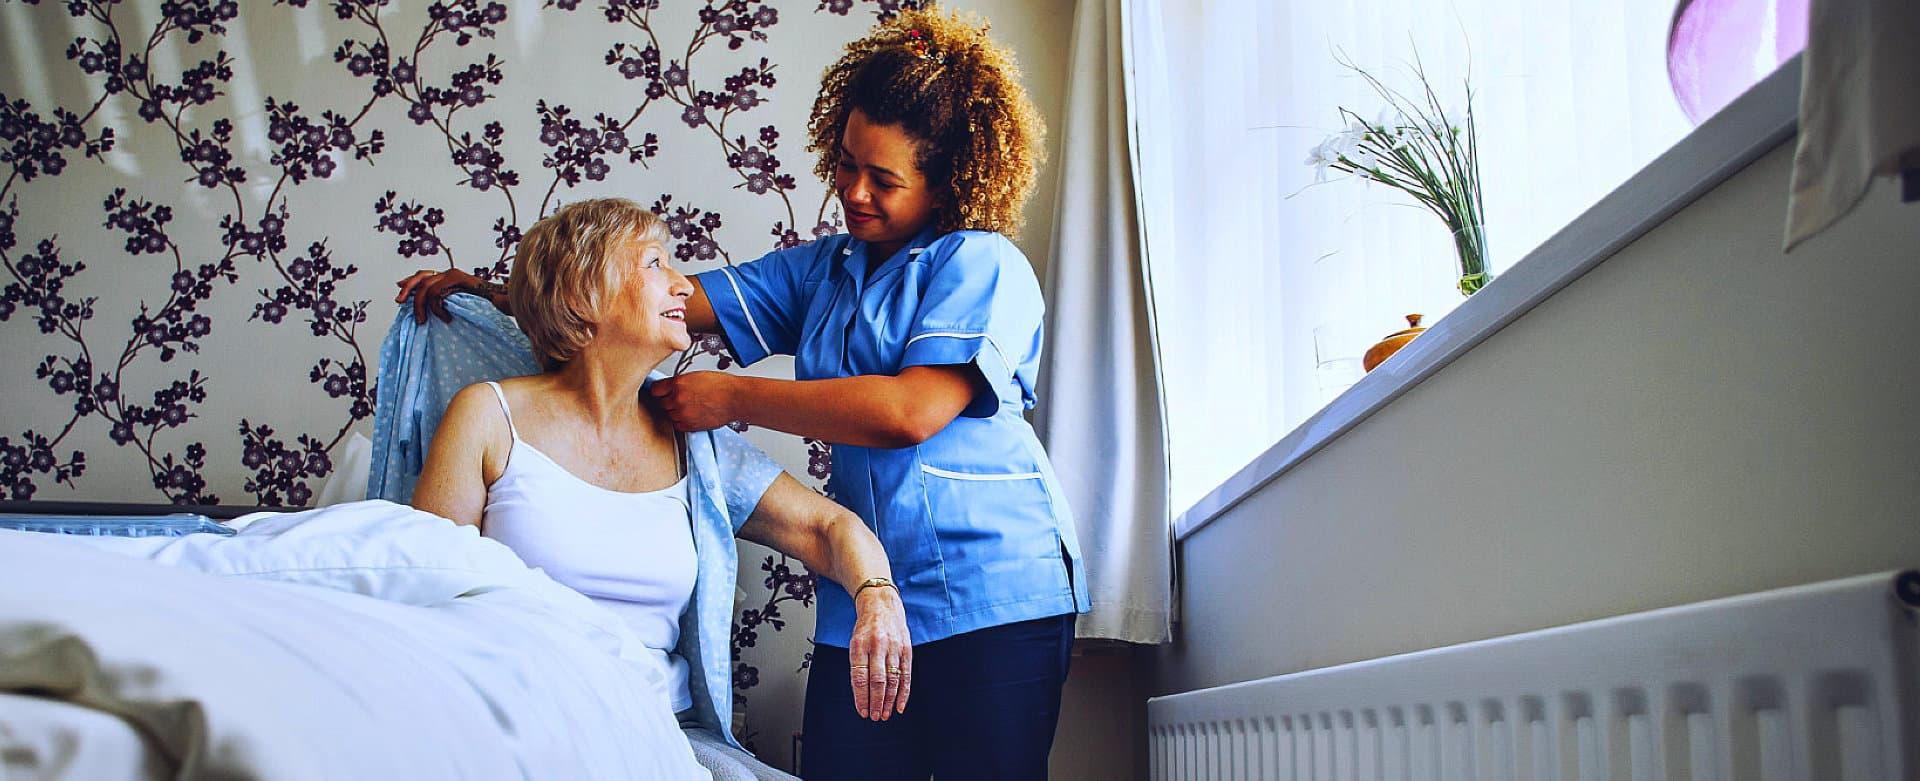 female caregiver assisting senior woman